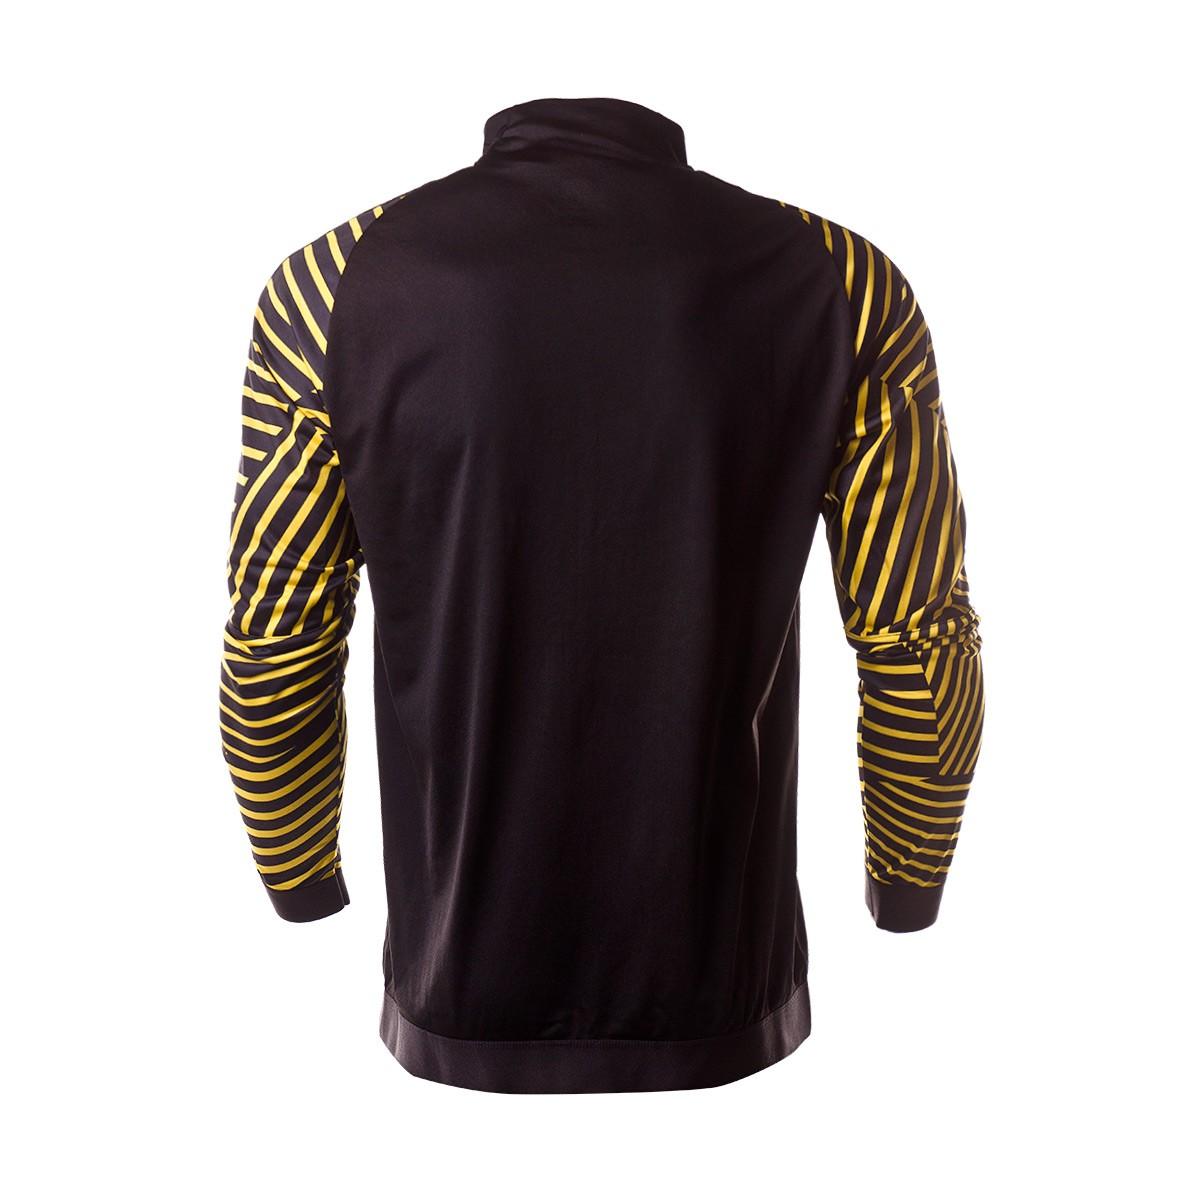 Jacket Puma BVB Borussia Dortmund Stadium Logo 2018-2019 Puma black ... c049a4d8b